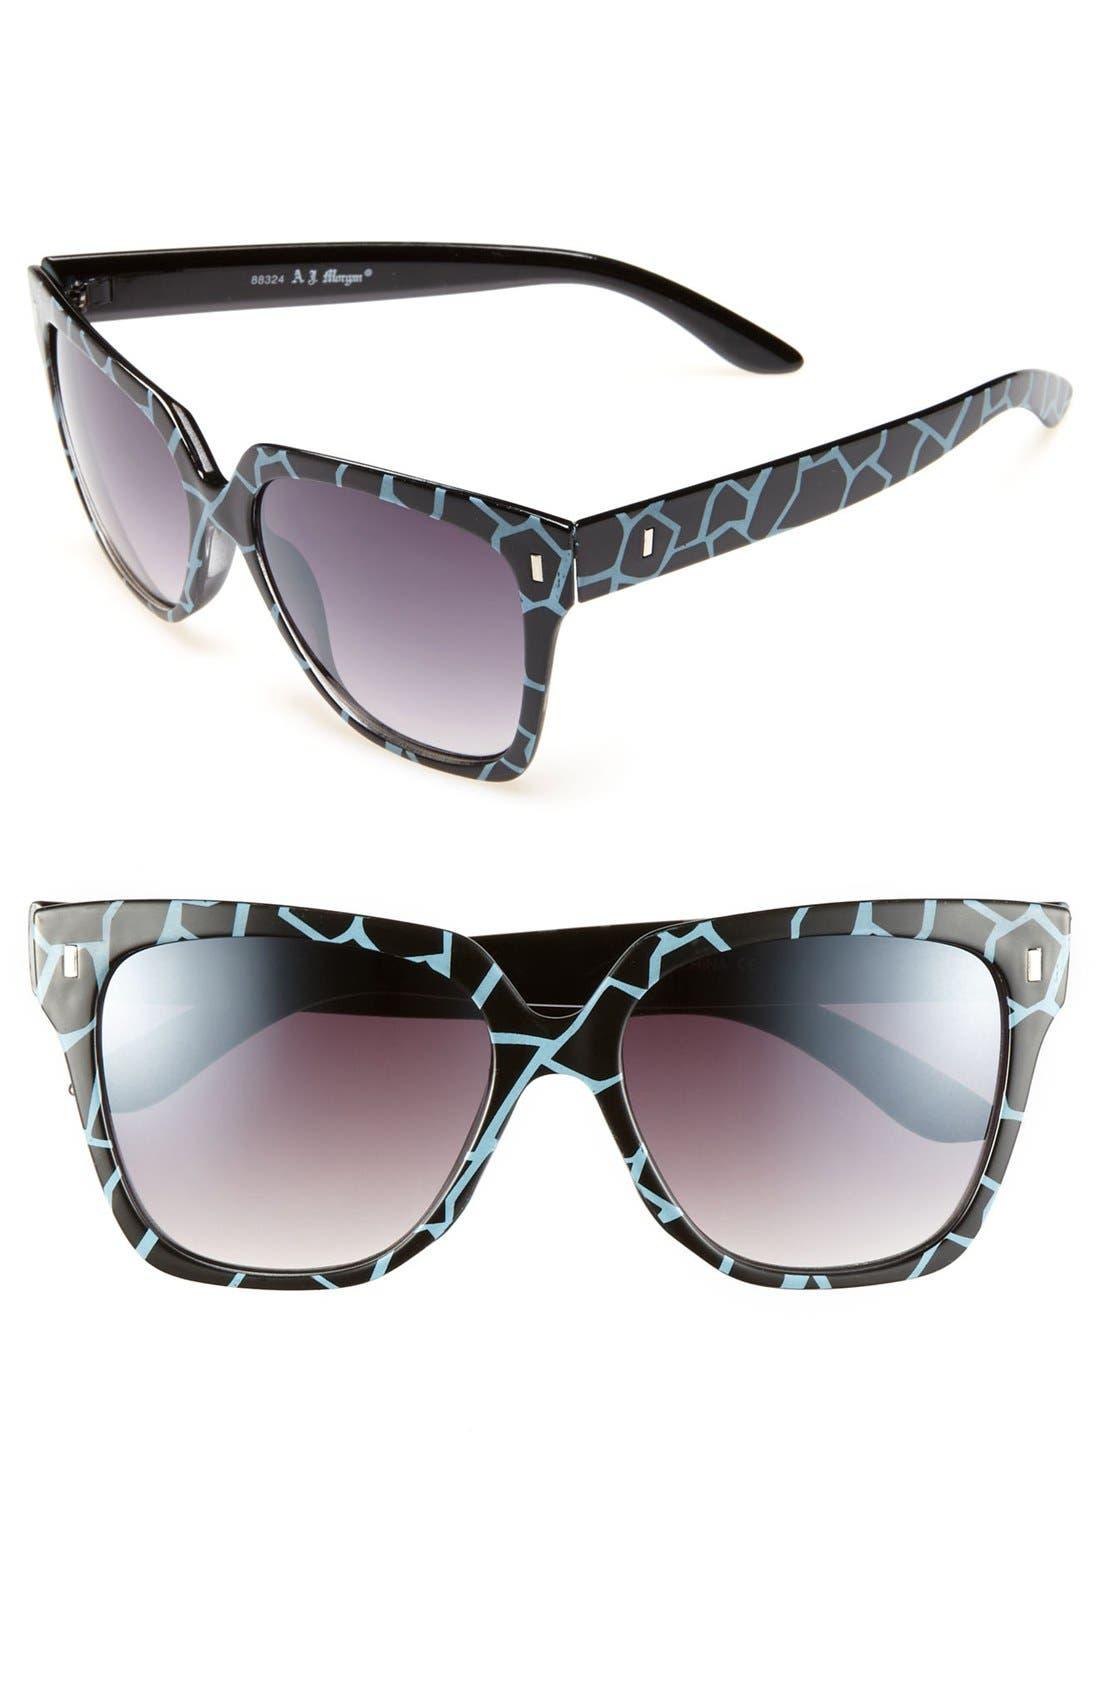 Alternate Image 1 Selected - A.J. Morgan Sunglasses